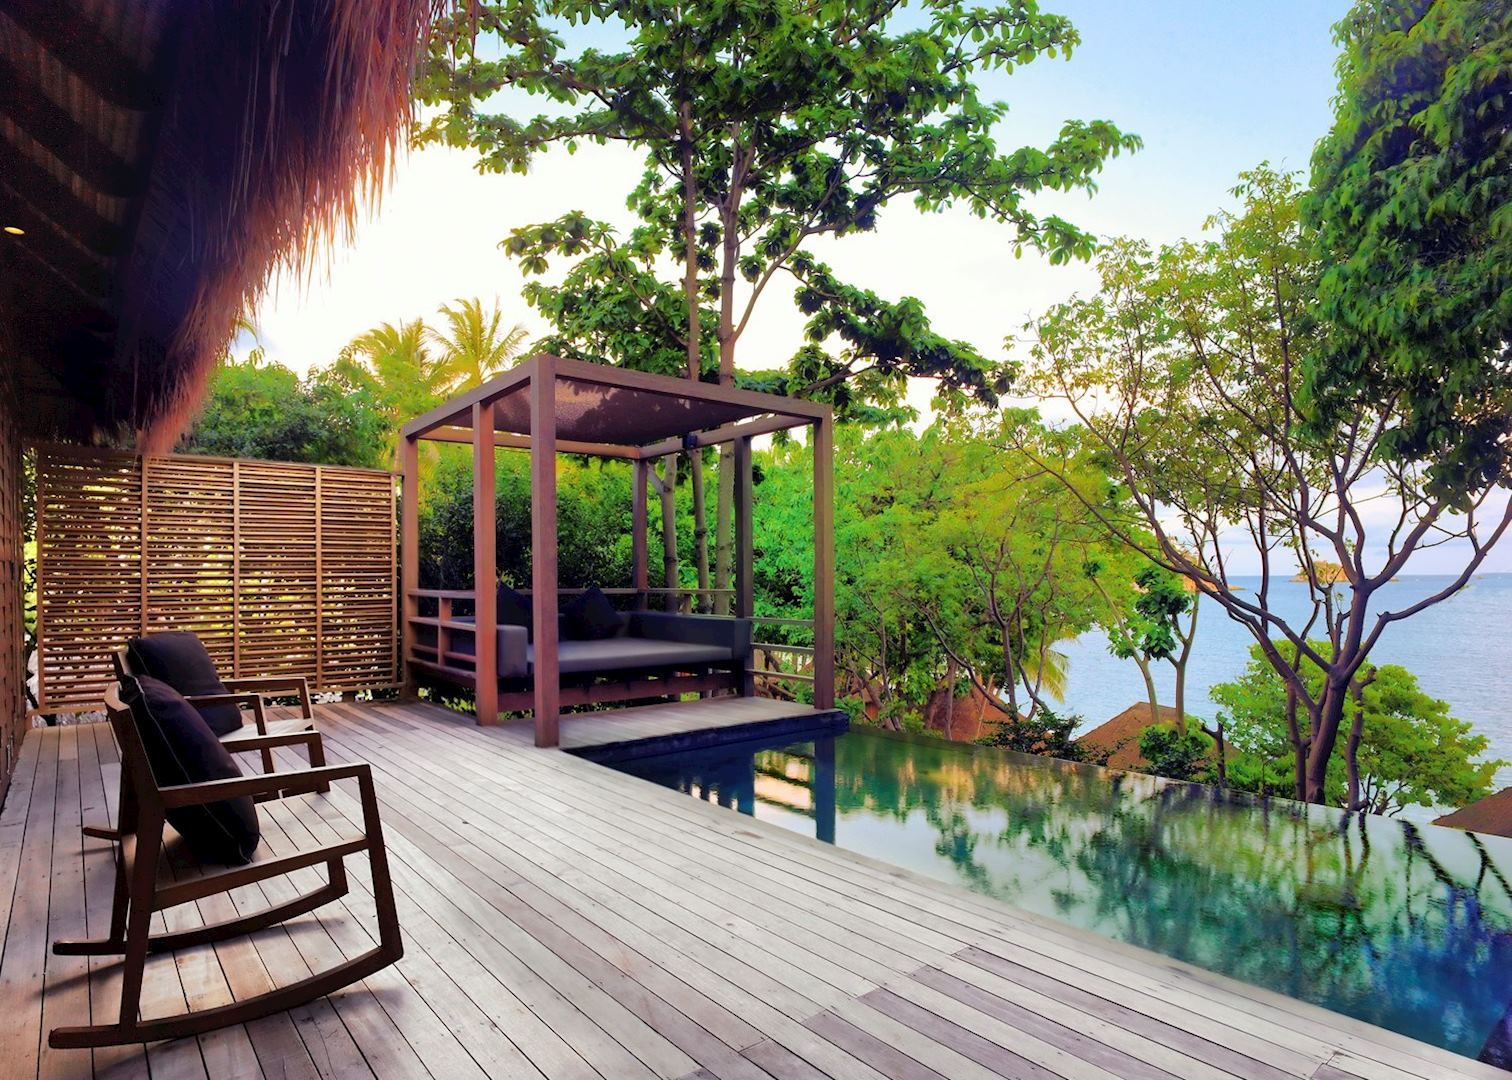 Haad tien beach resort and koh samui audley travel for Koh tao cabana koi pool villa